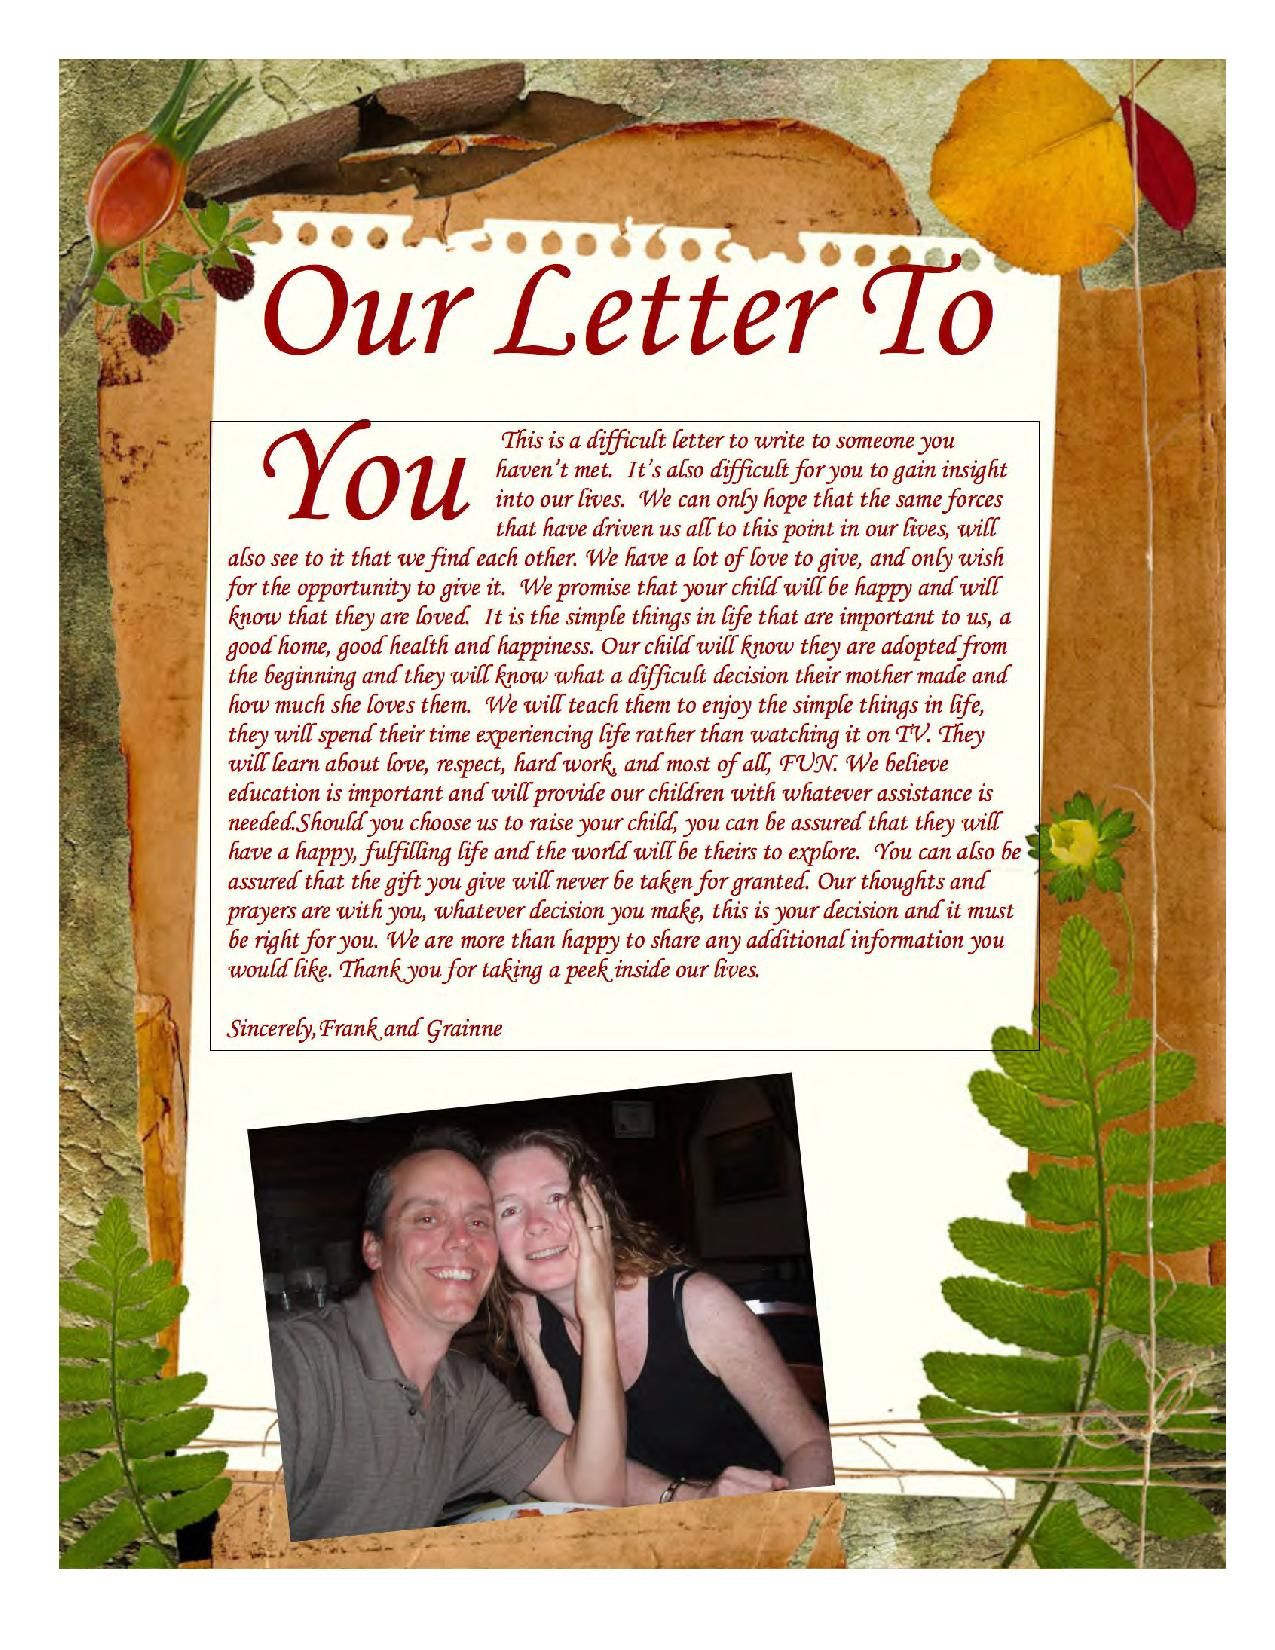 Our adoption profile letter | Adoption | Adoption, Birth mother